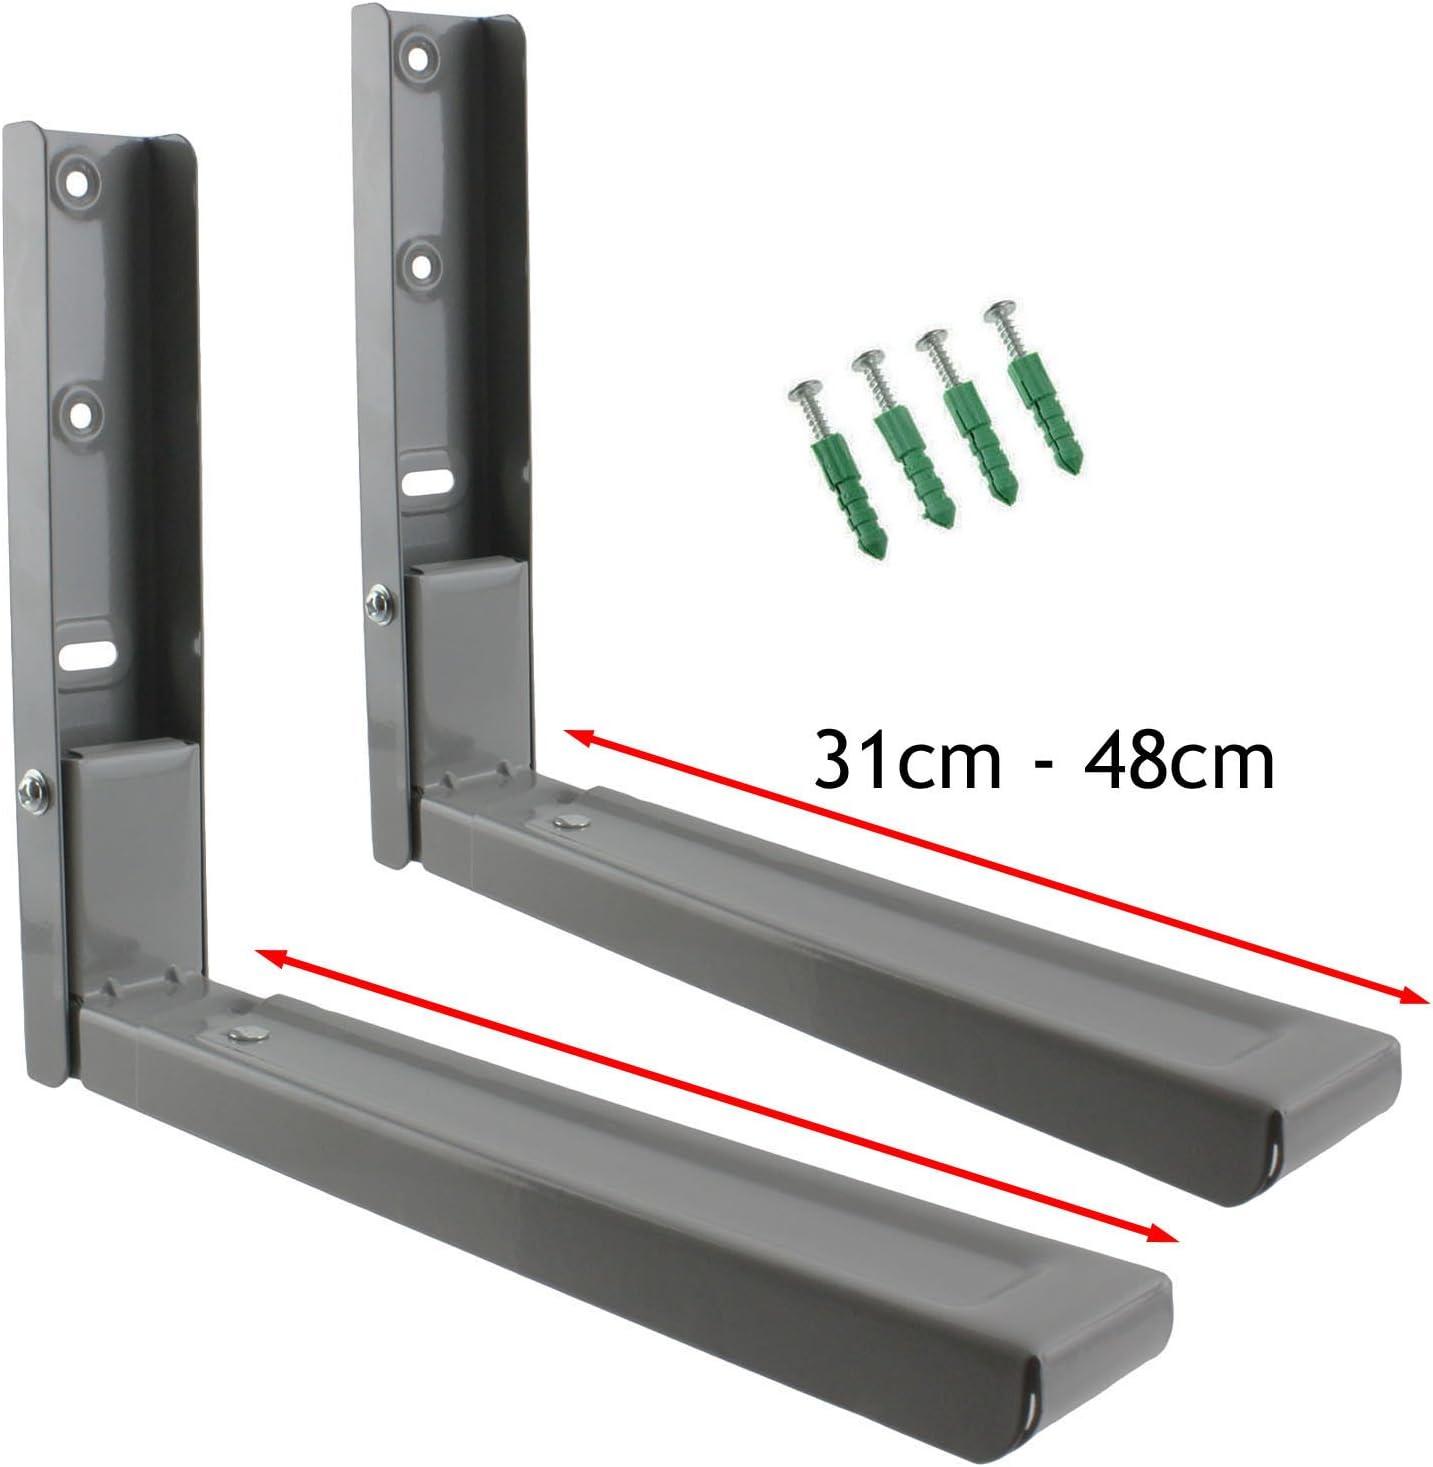 Spares2go Soportes de montaje de pared extensibles para Daewoo microondas (plateado/gris)